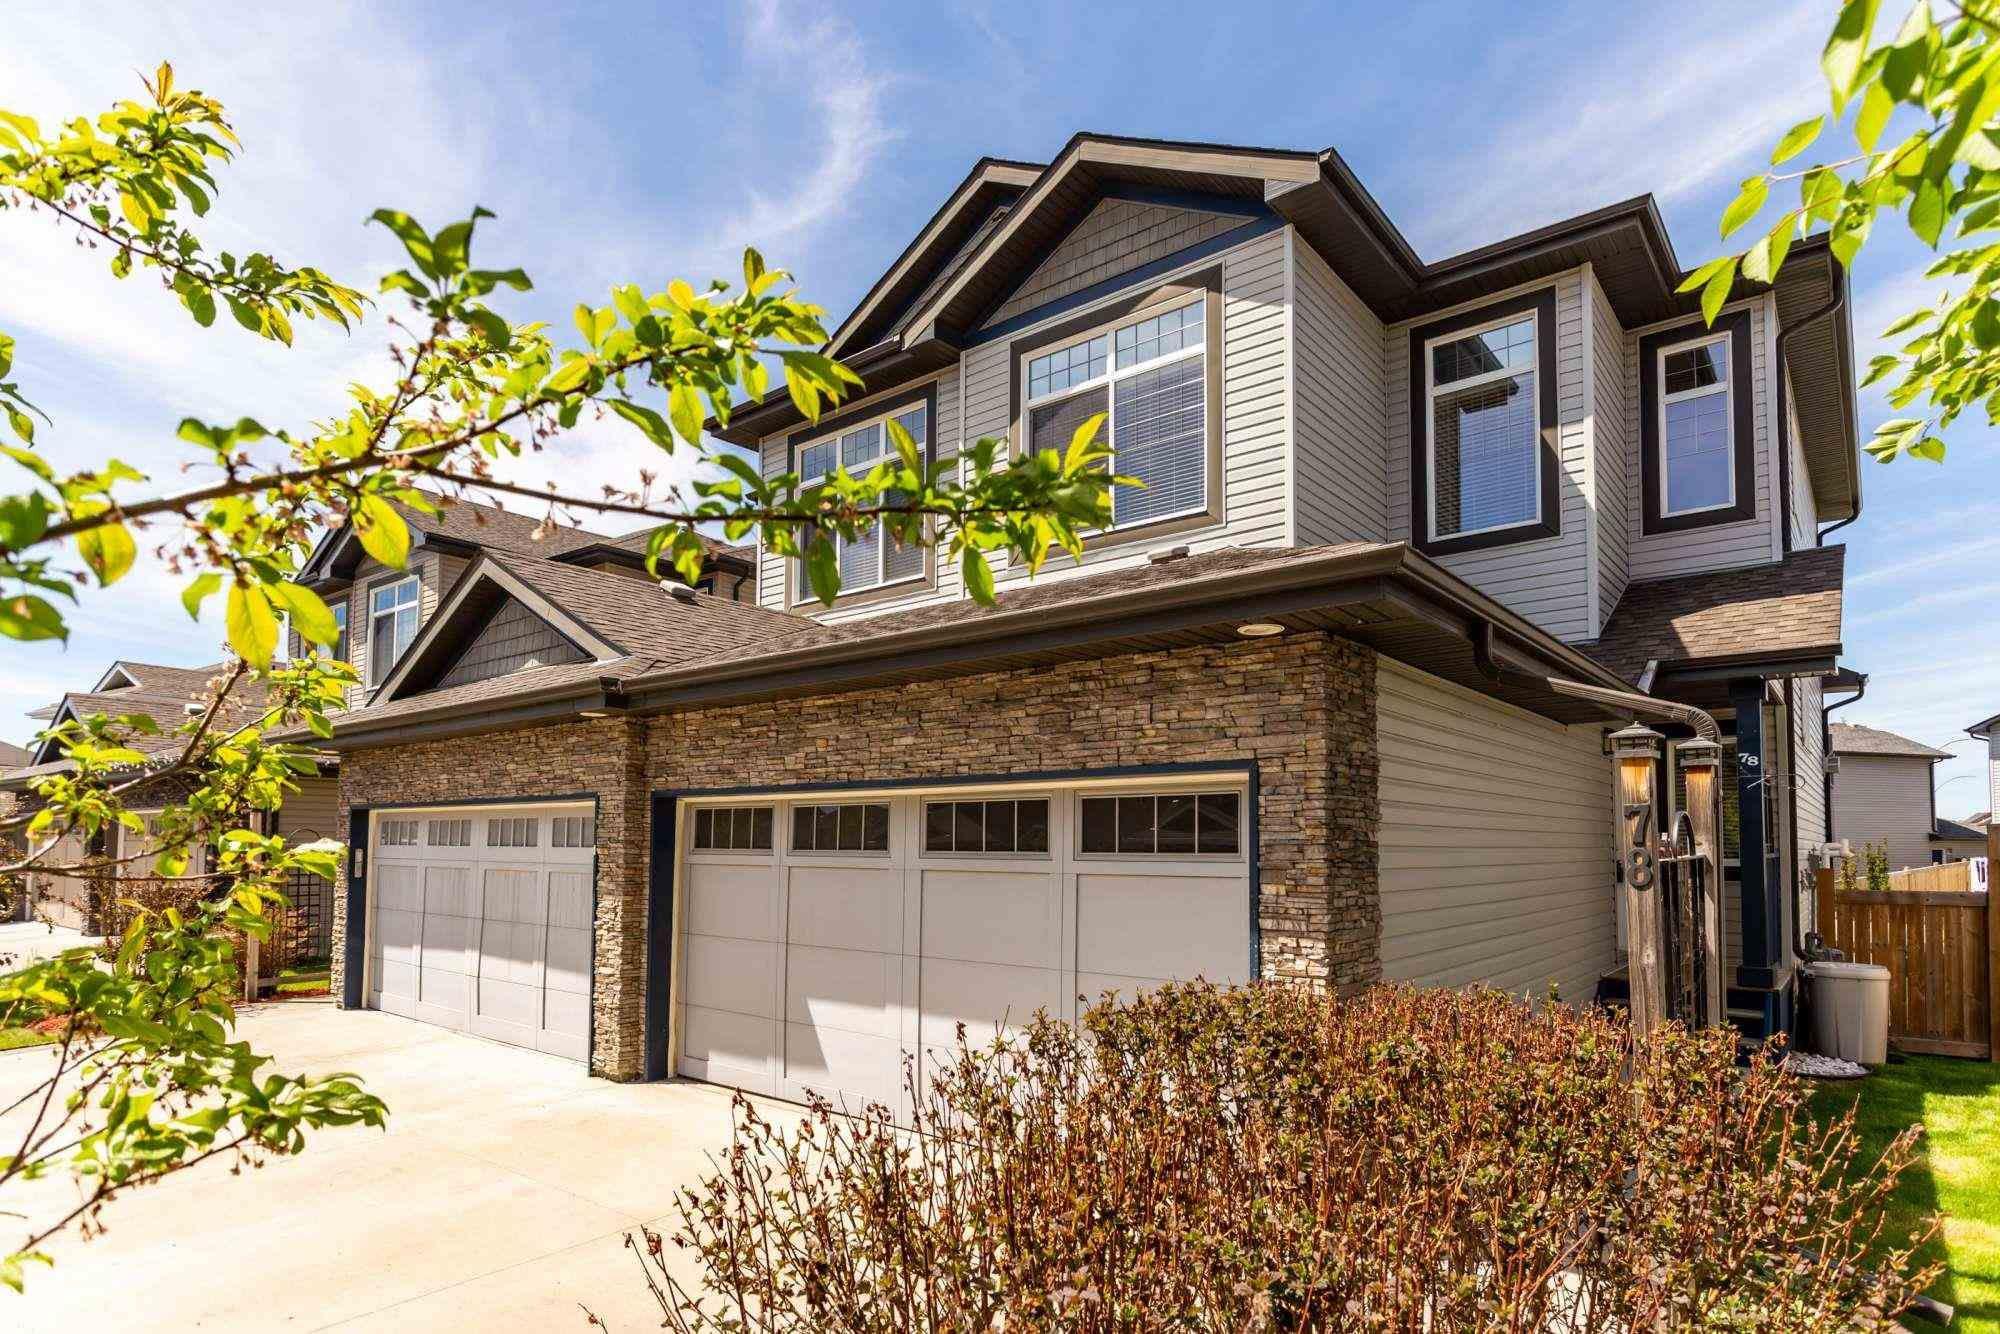 Main Photo: 78 AUSTIN Court: Spruce Grove House Half Duplex for sale : MLS®# E4247987